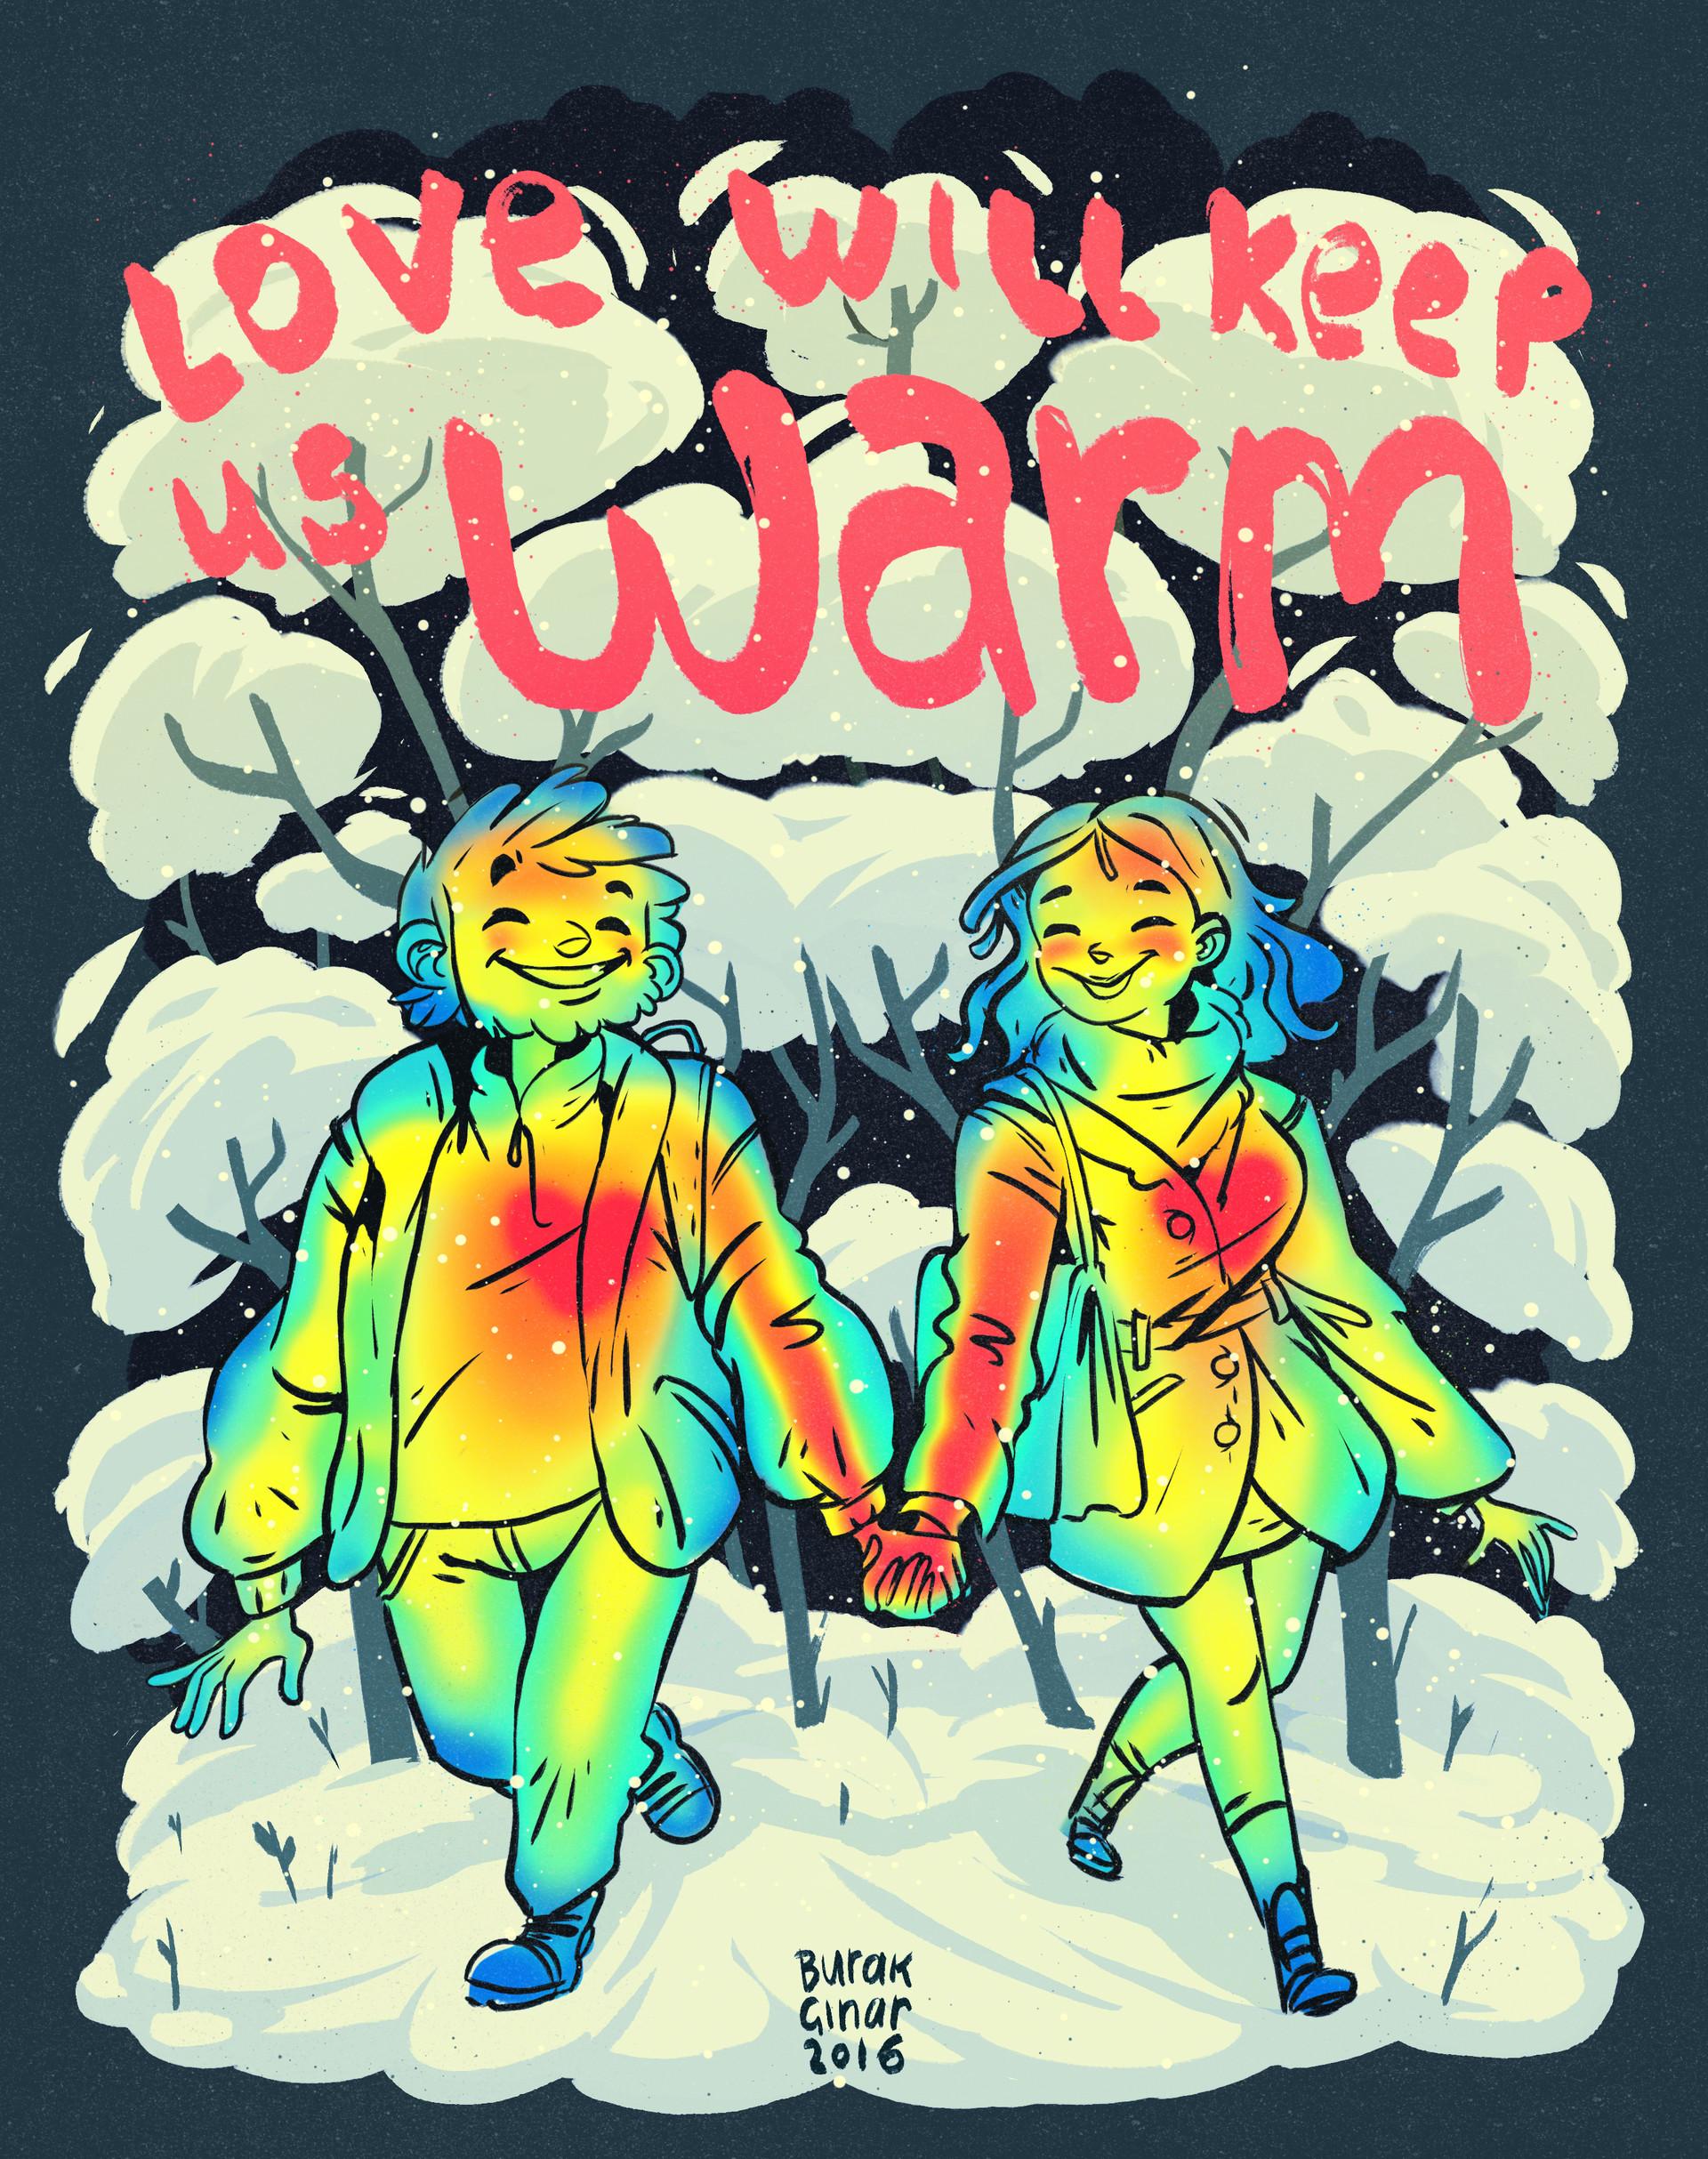 Burak cinar love will keep you warm